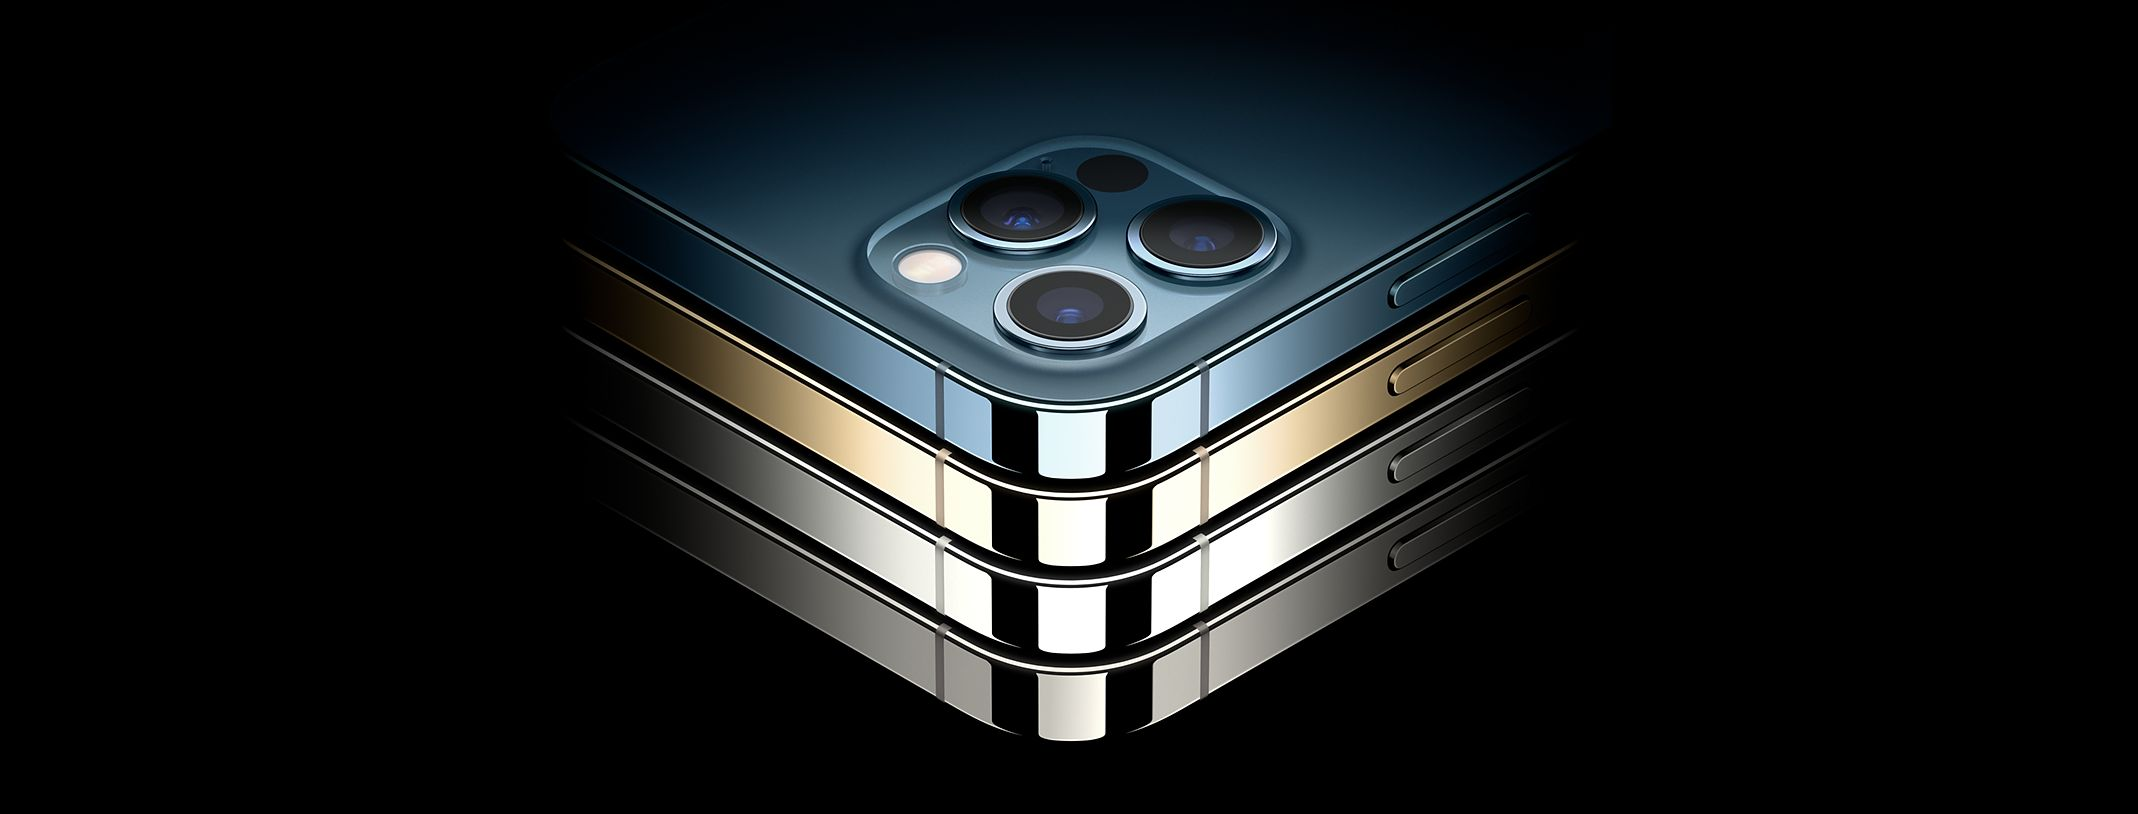 iphone-12-pro-gallery-3.jpeg